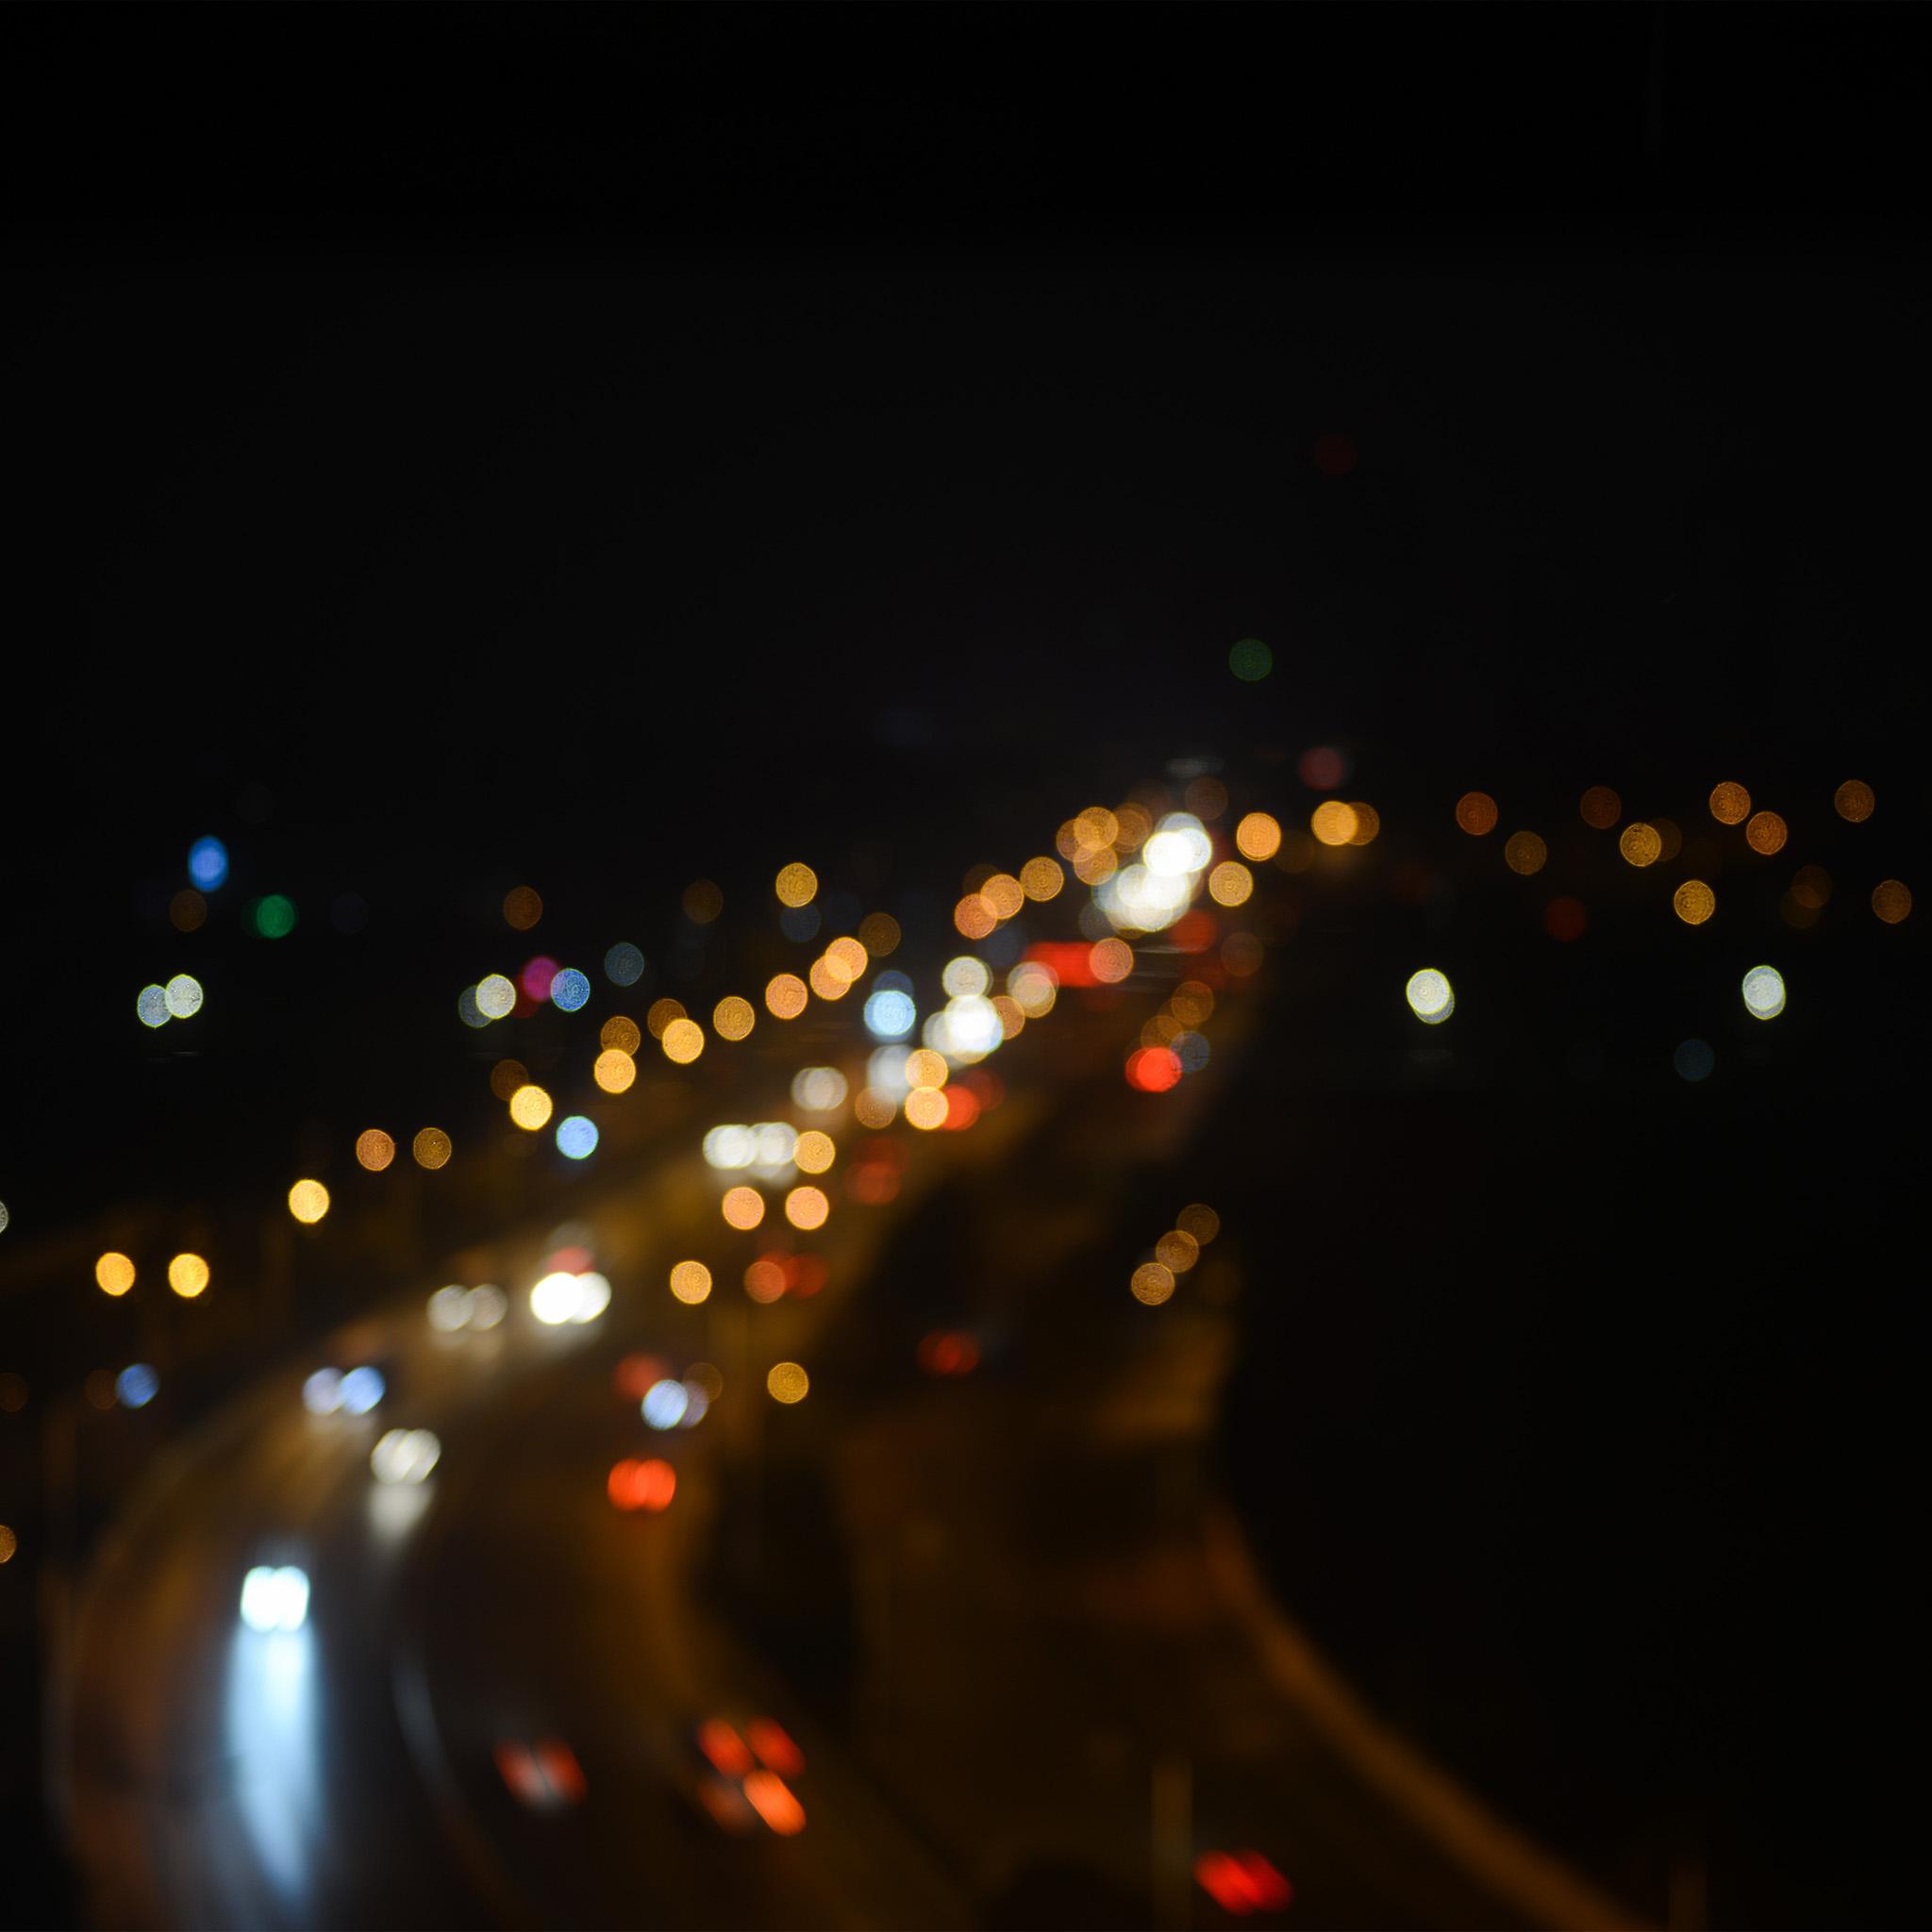 nv83-night-bokeh-light-street-car-nature-wallpaper